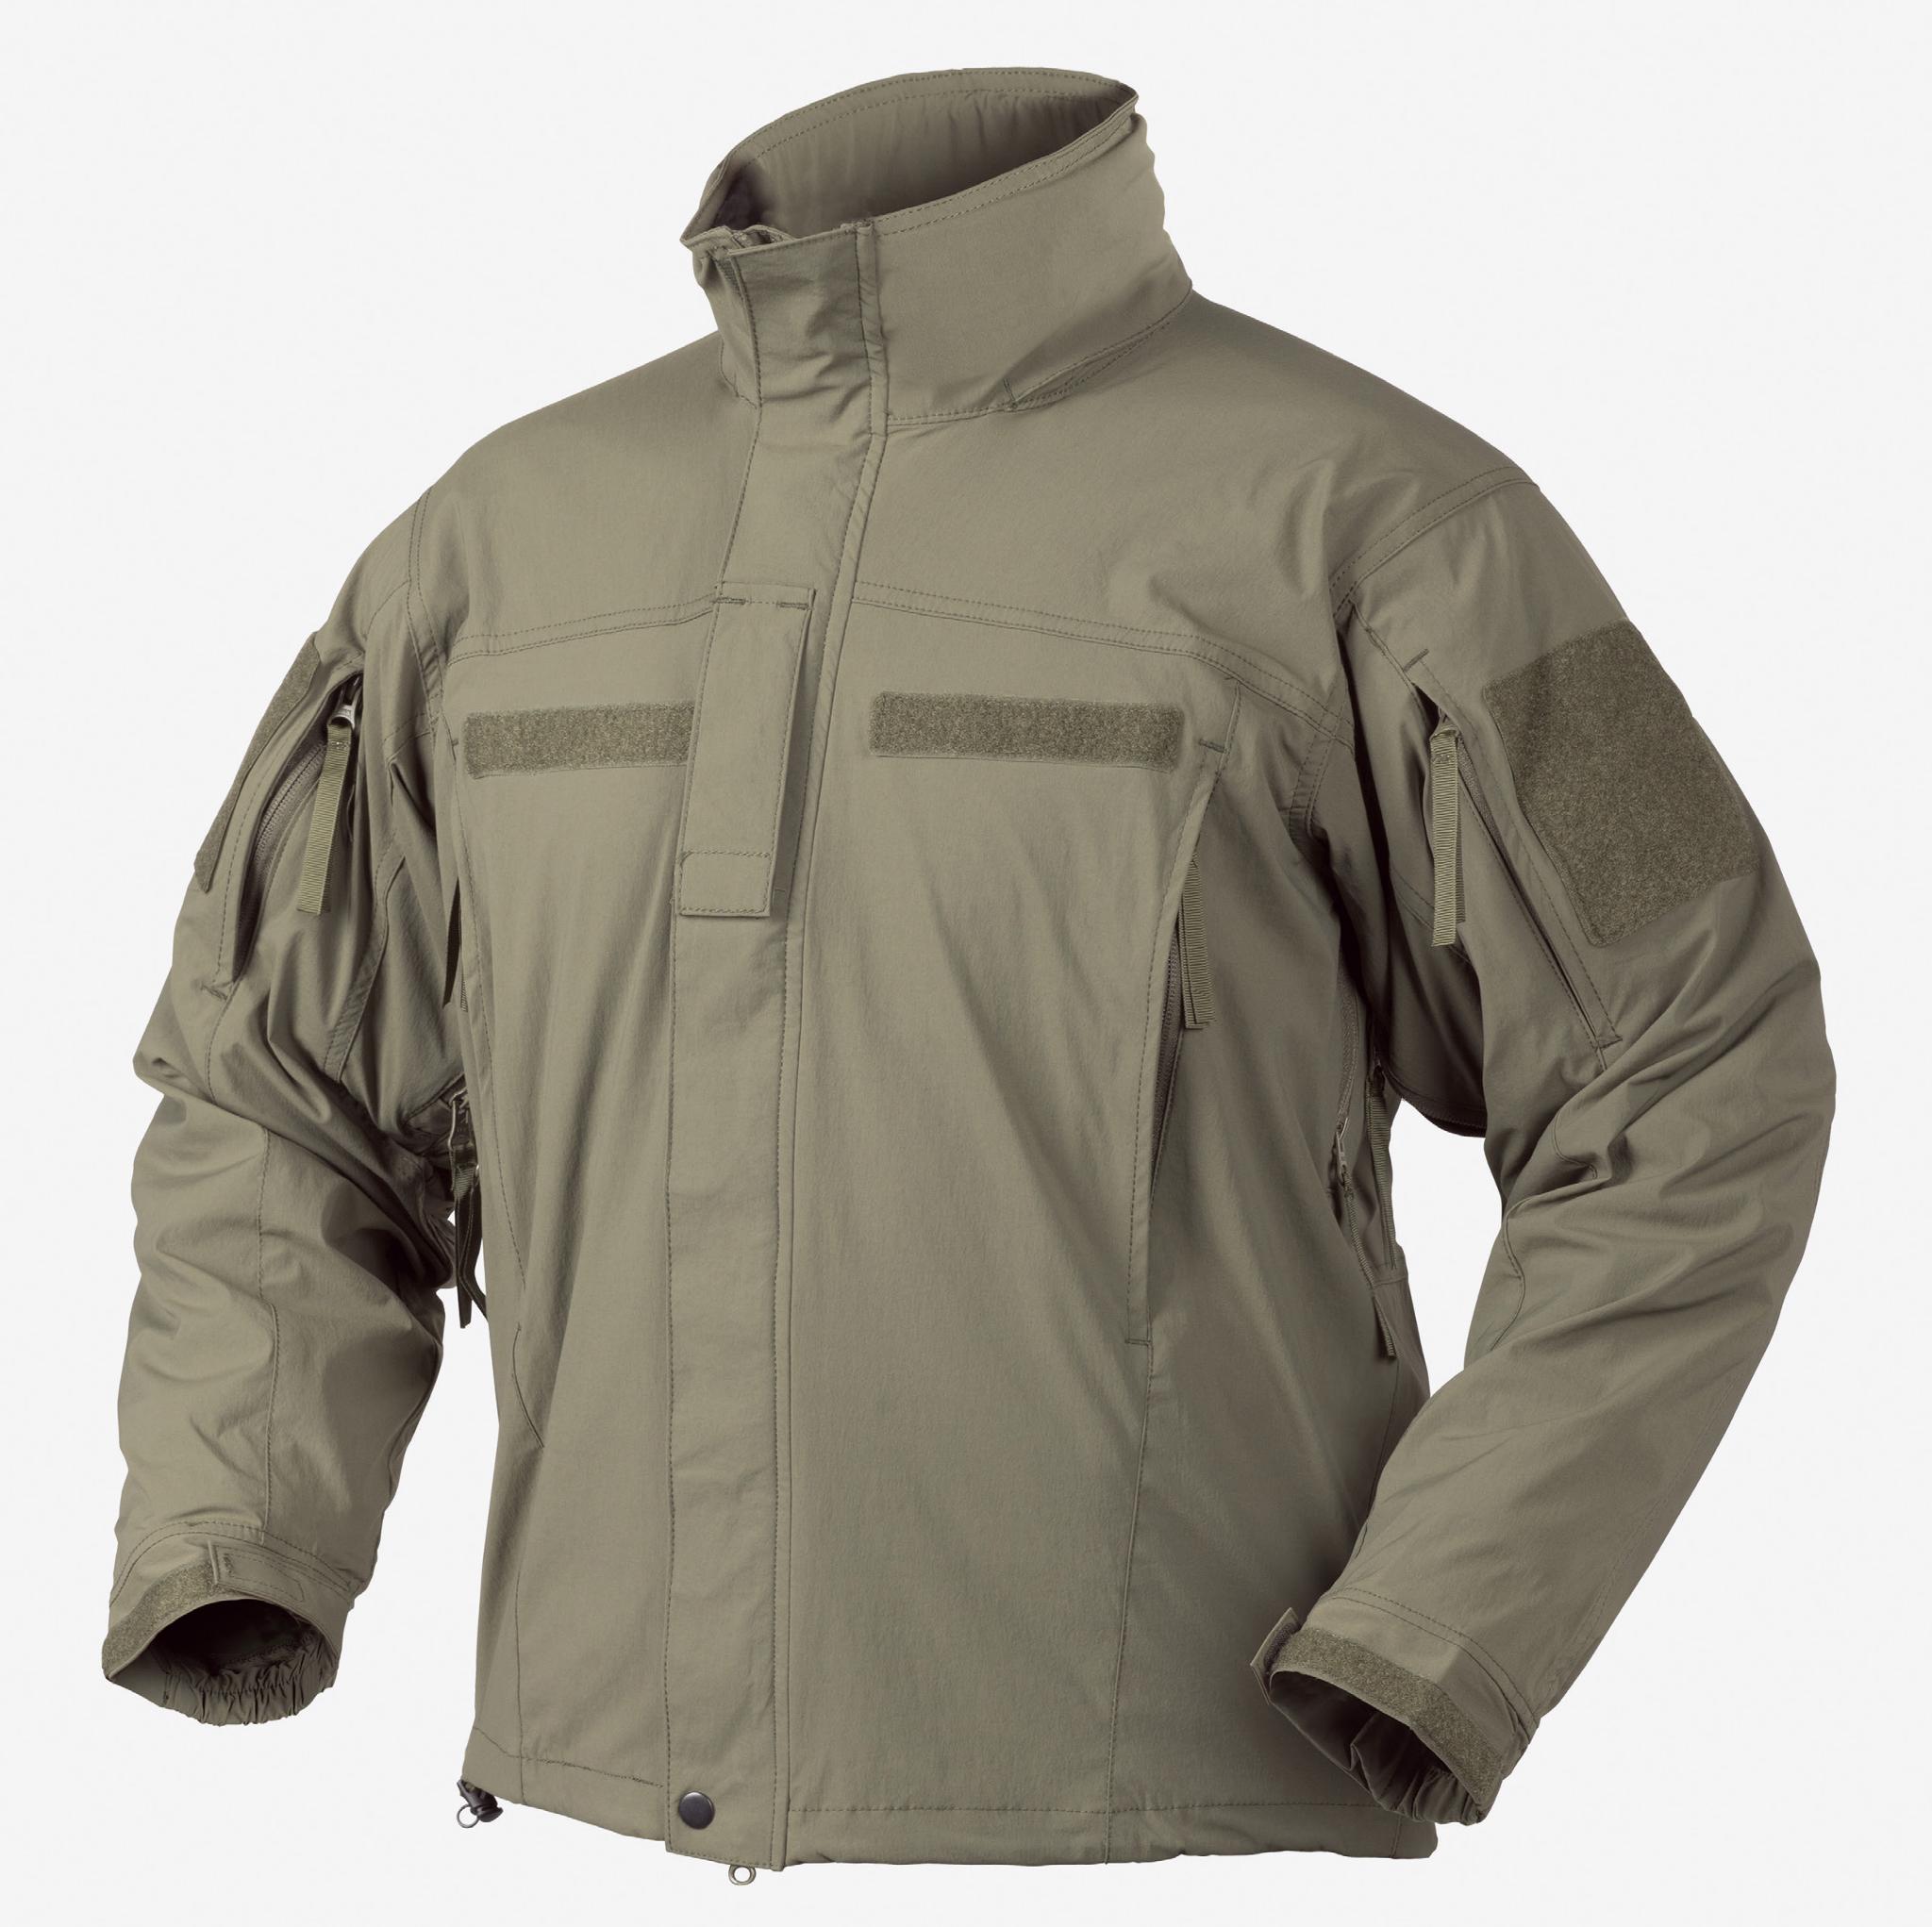 Helikon-Tex APCU Level V Version II Jacket and Trousers